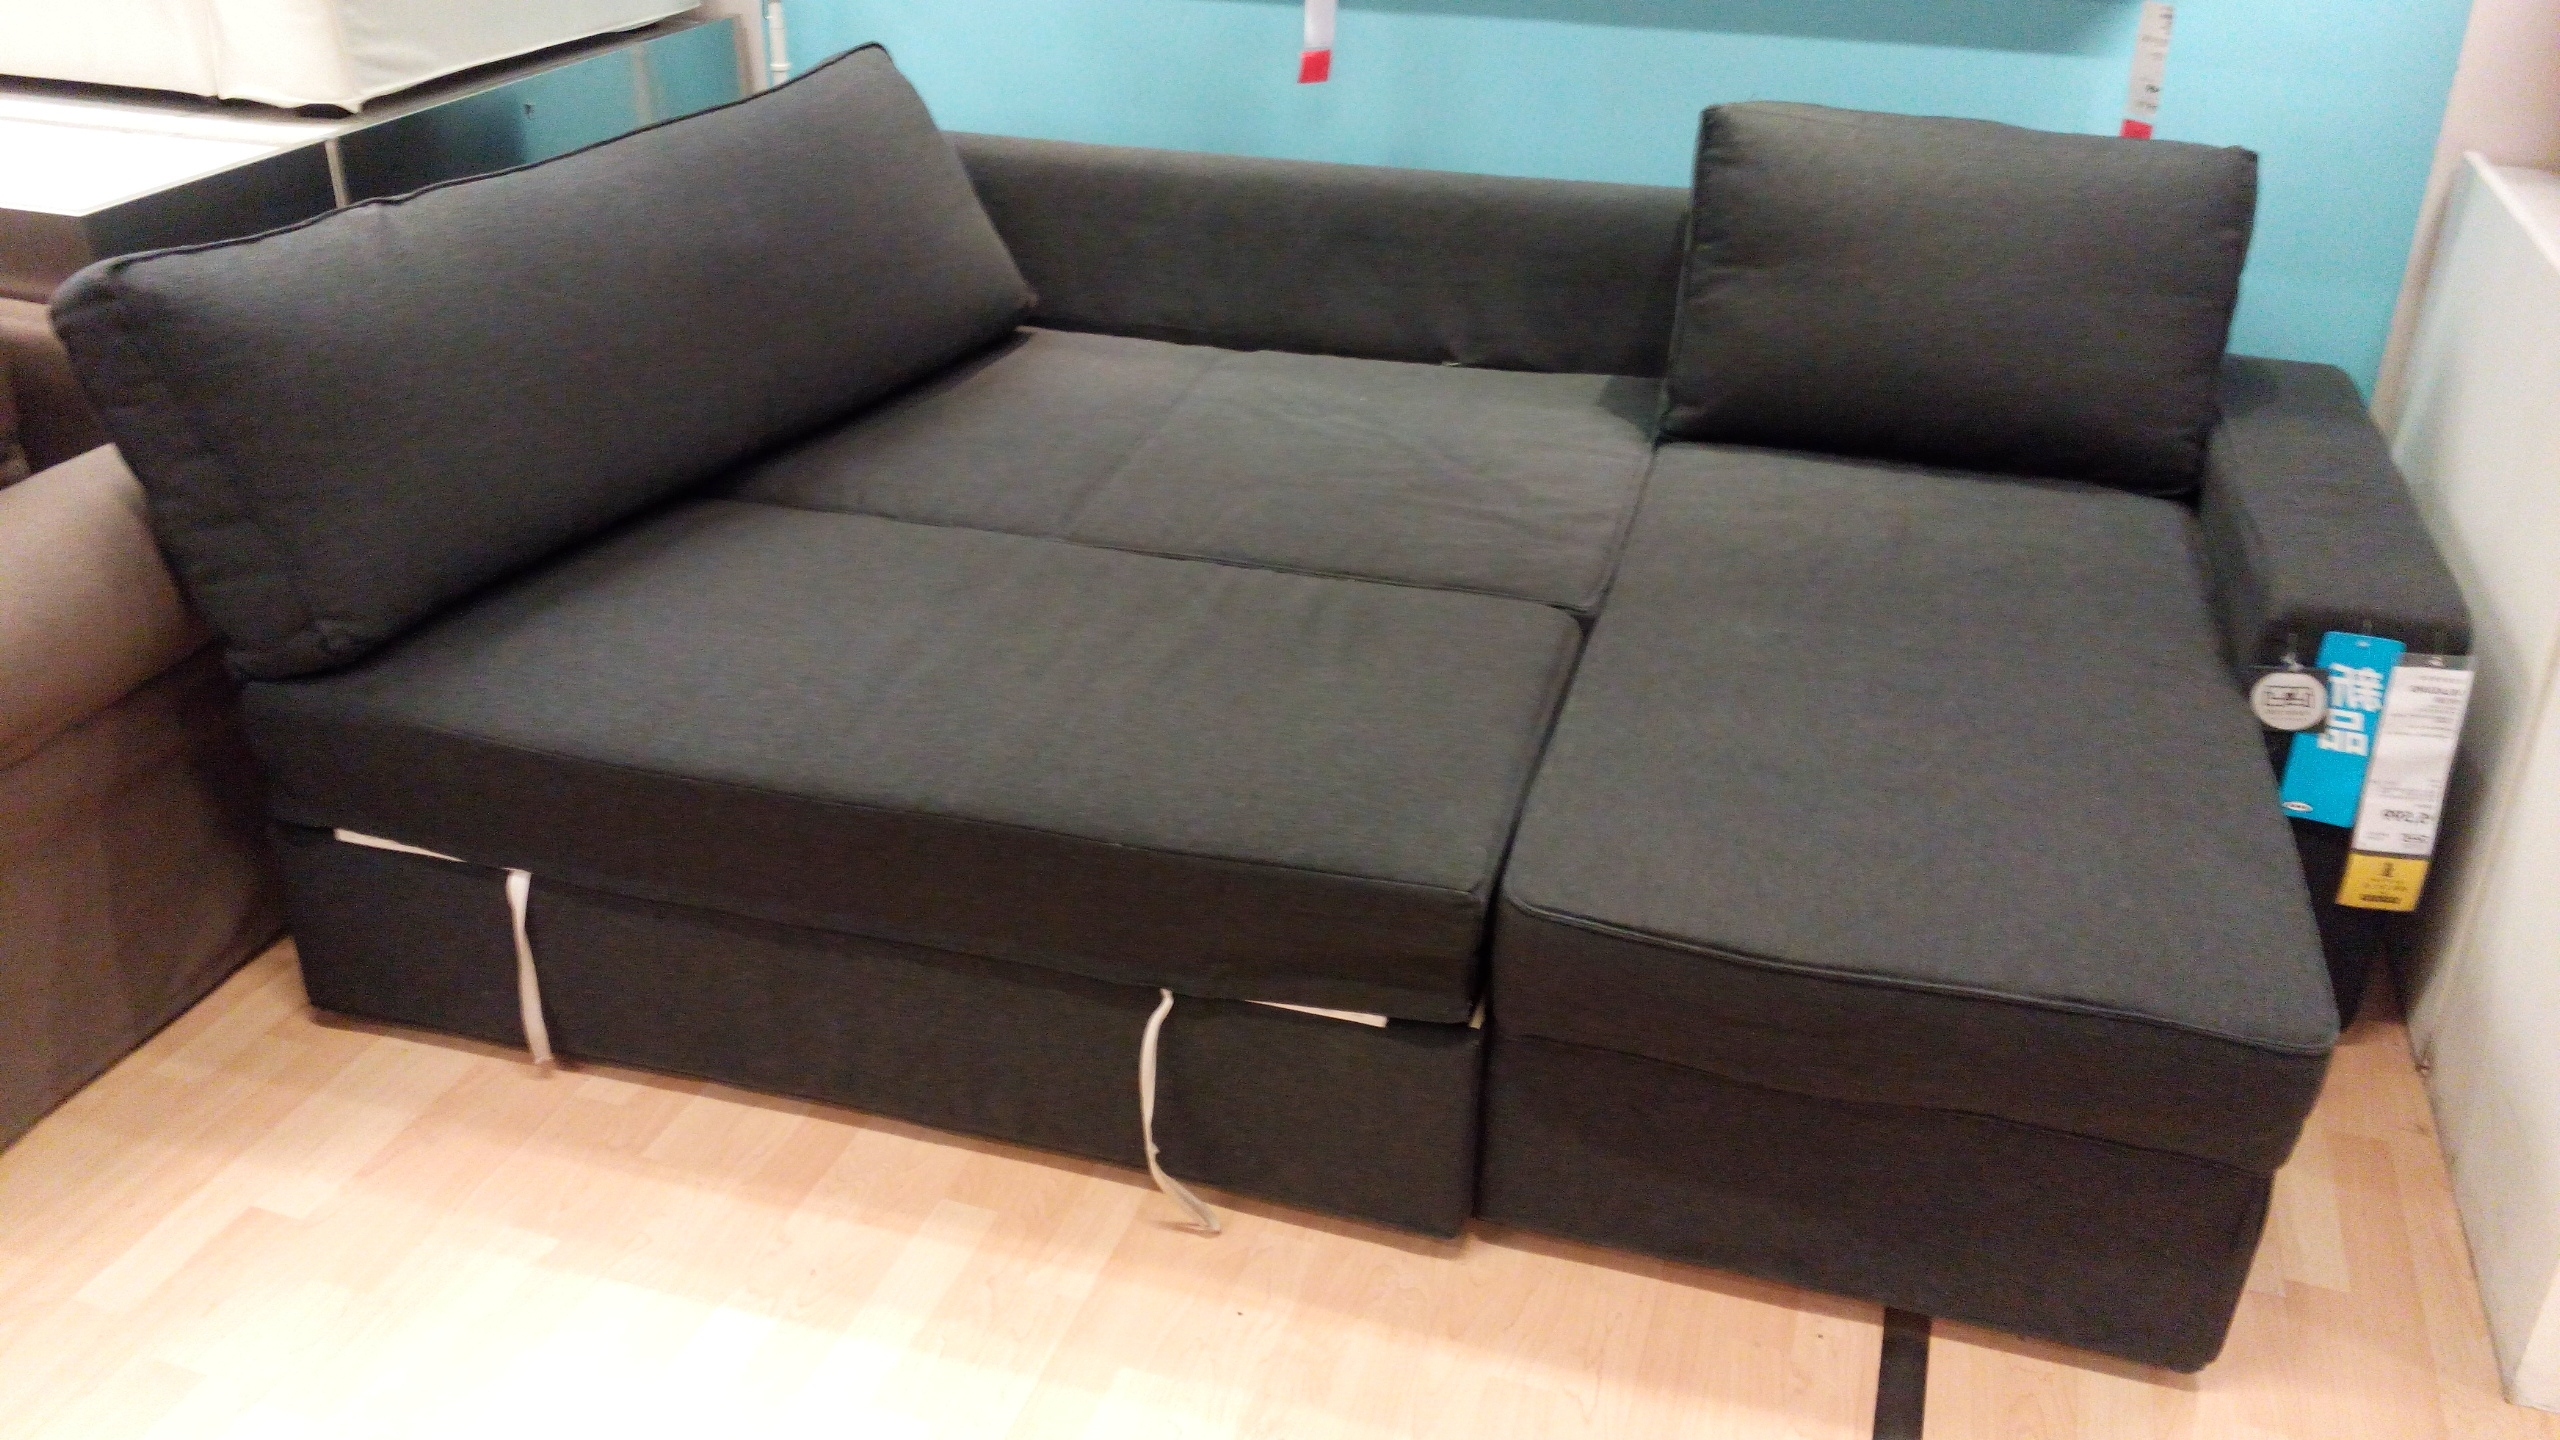 Chaise Lounge Sleeper Sofa (View 8 of 15)